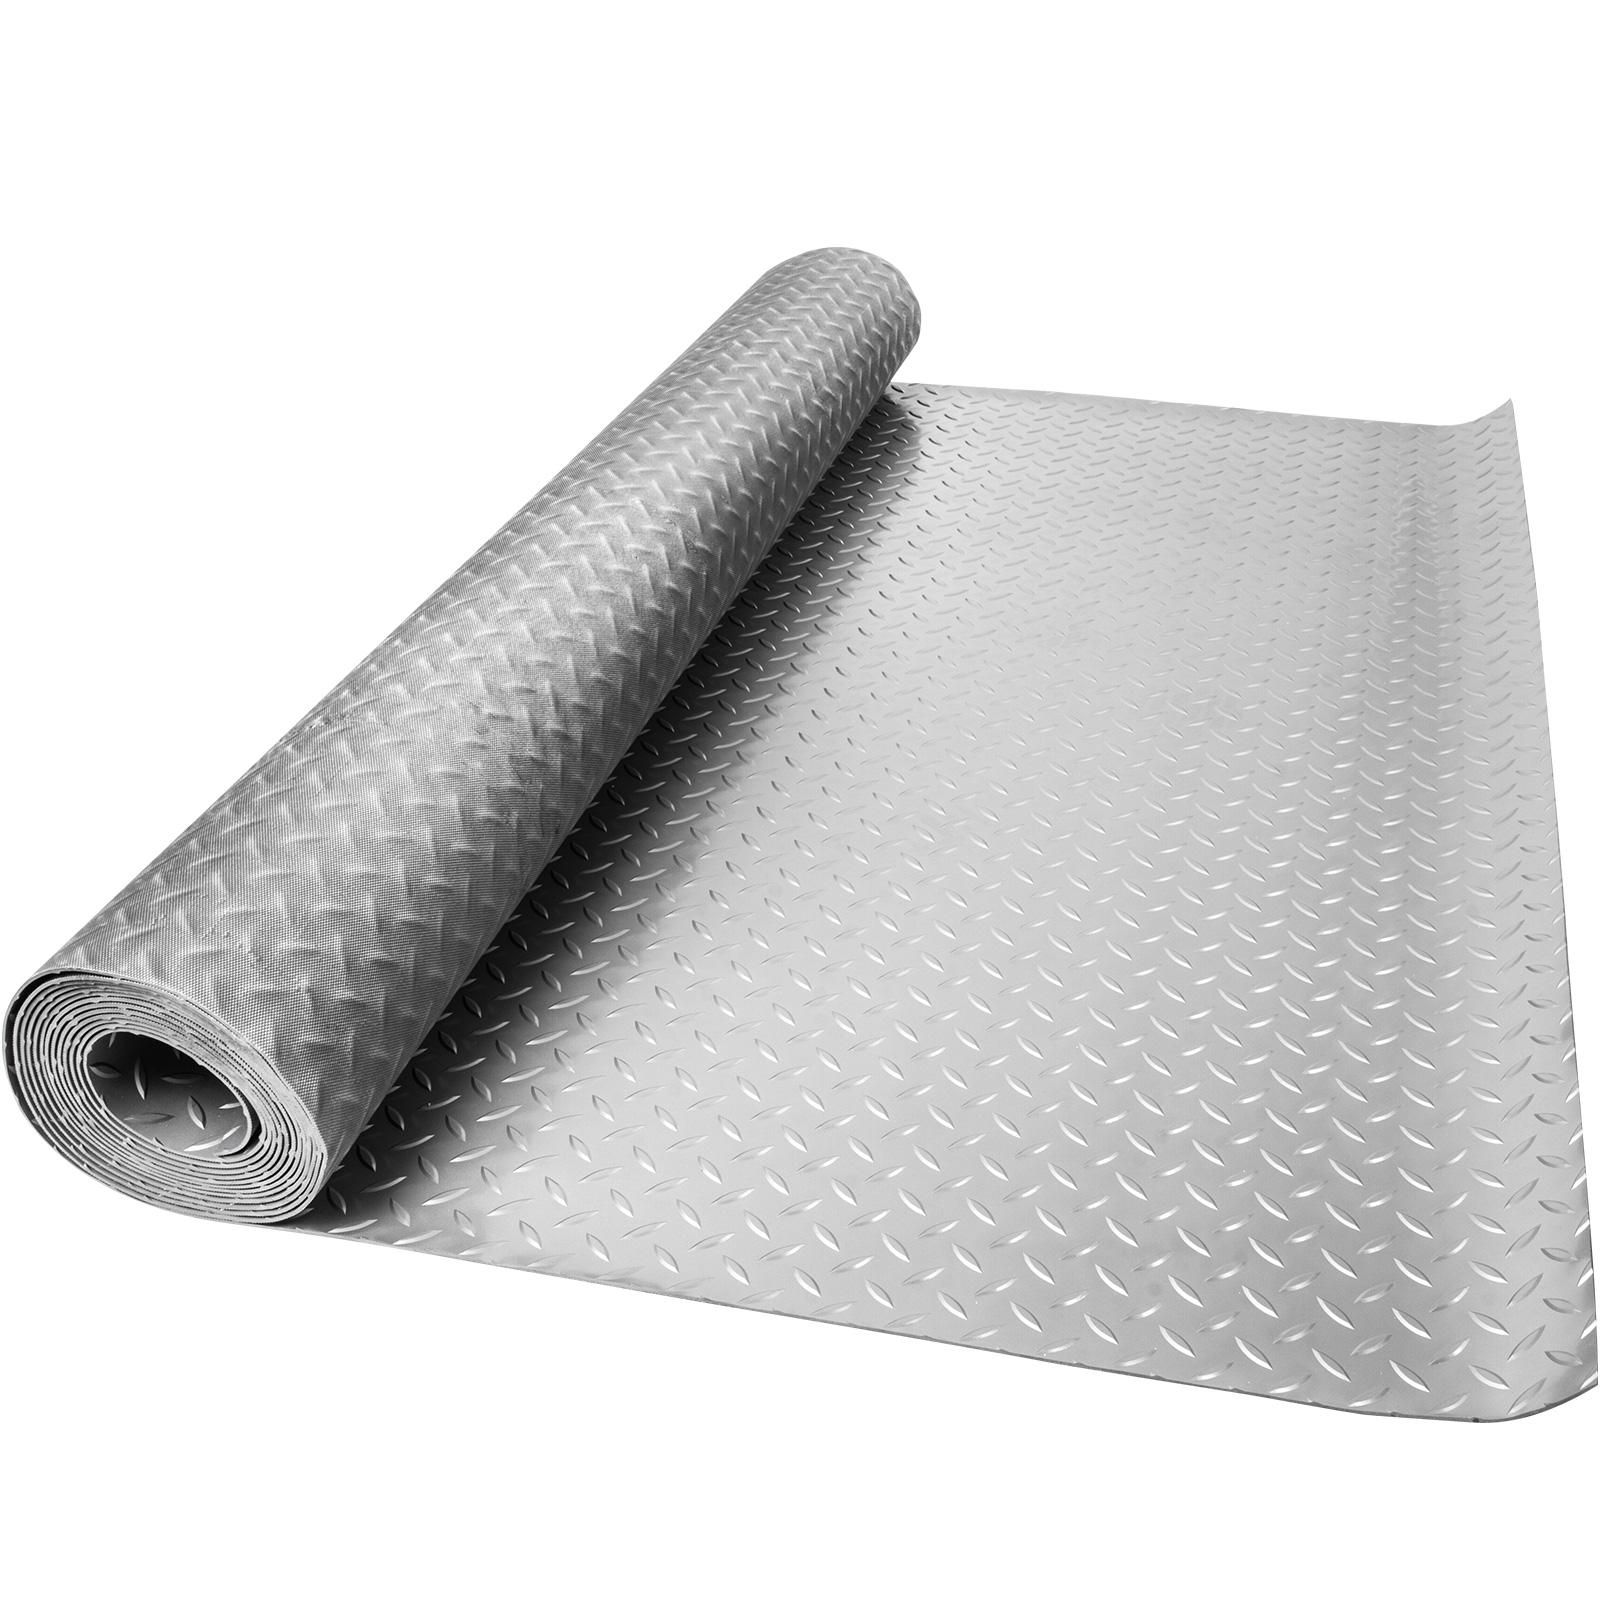 thumbnail 119 - Garage Flooring Mat Roll Car Trailer Floor Covering 1.1m Width Gym Floor Roll